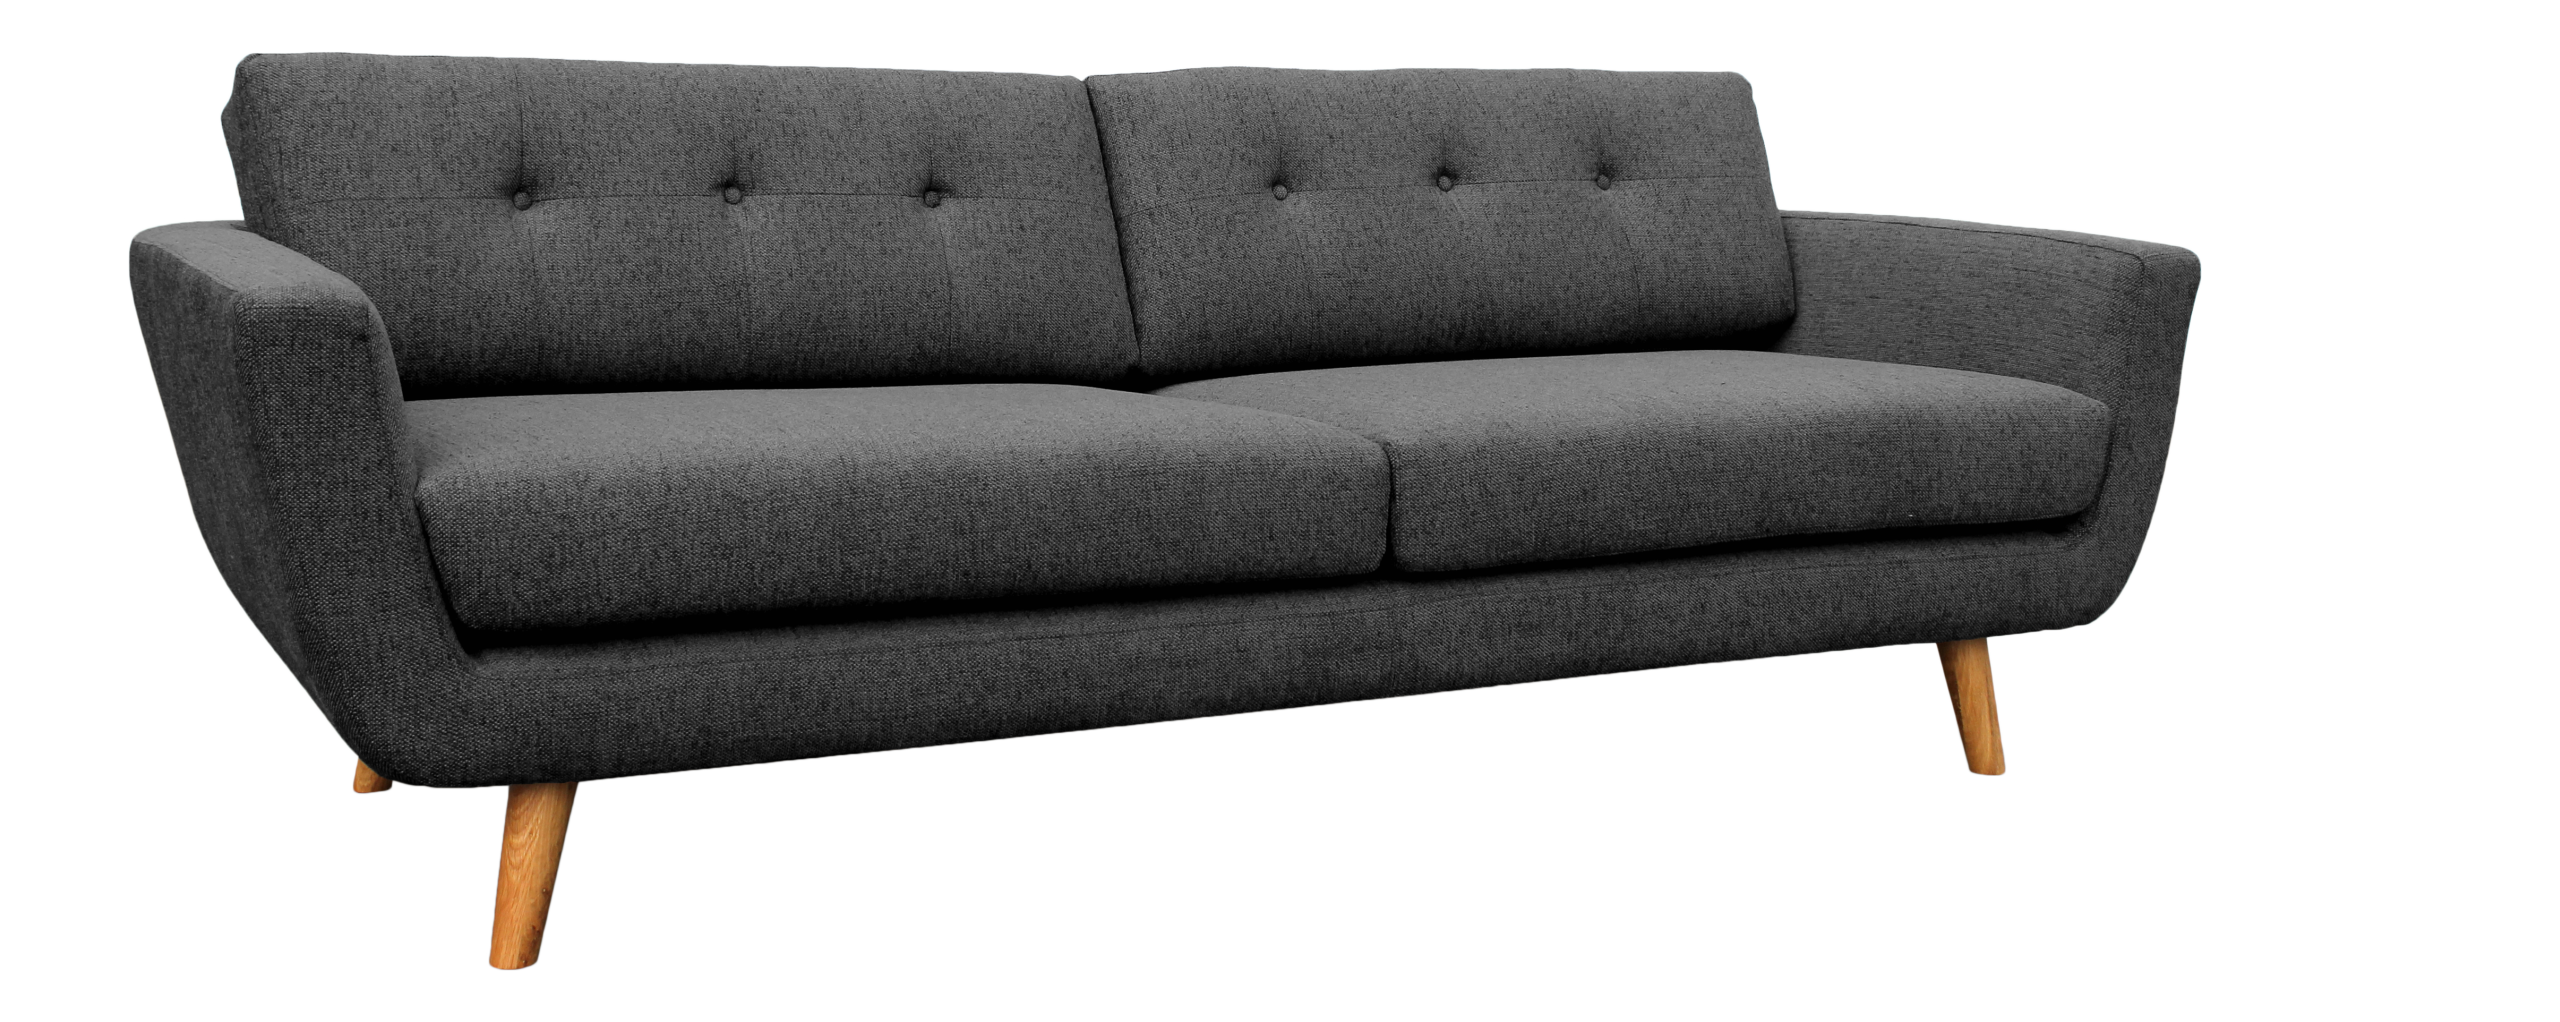 Bayam 3 Sitzer Sofa Aus Stoff